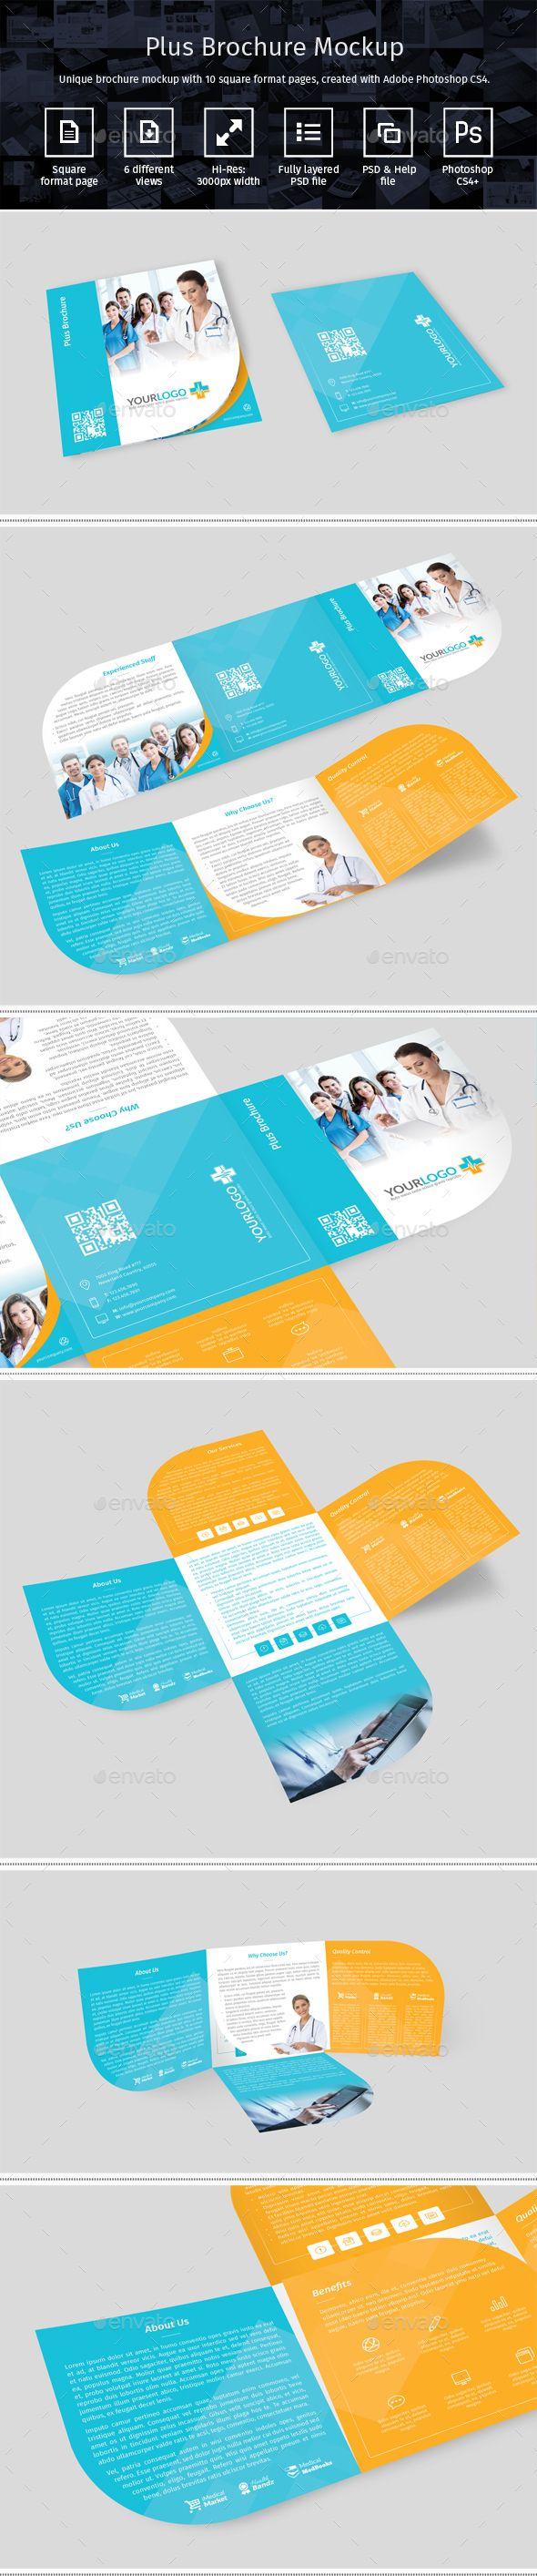 Plus Brochure Mockup. Download here: http://graphicriver.net/item/plus-brochure-mockup/15723405?ref=ksioks